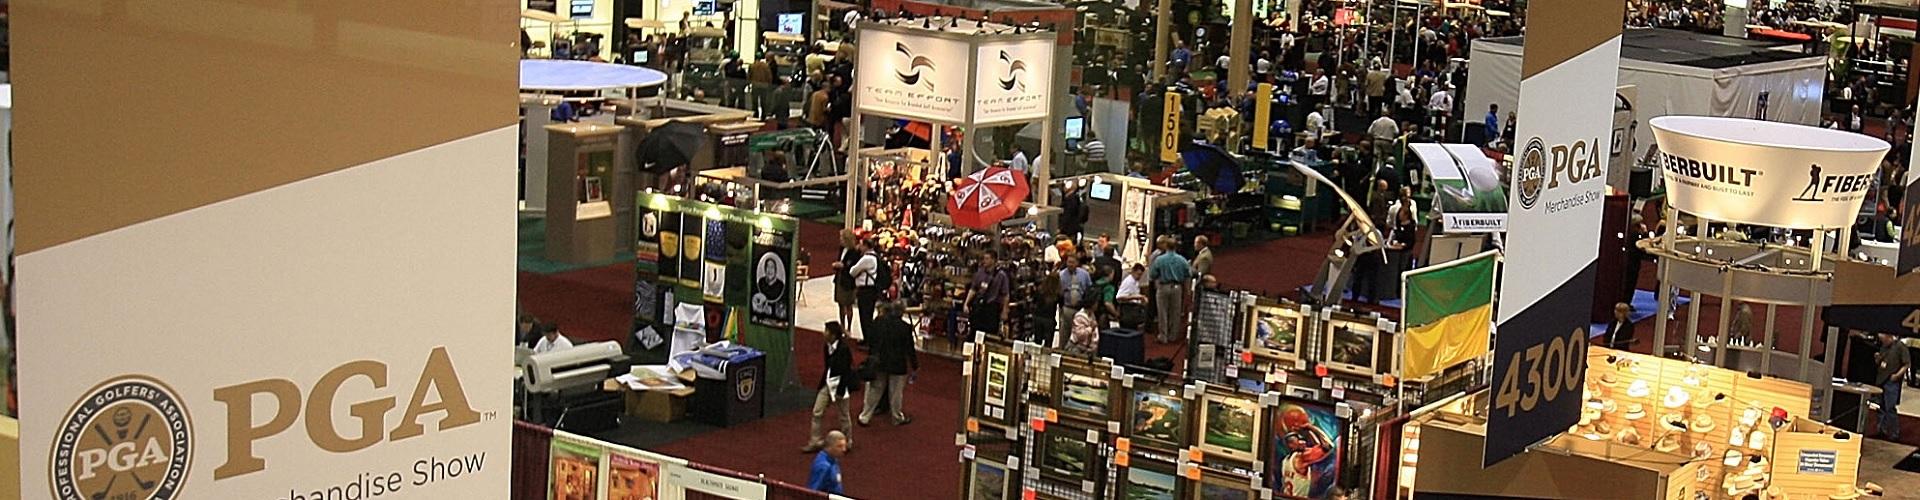 2016 PGA Merchandise Show - Orlando, FL - January 26th to 29th